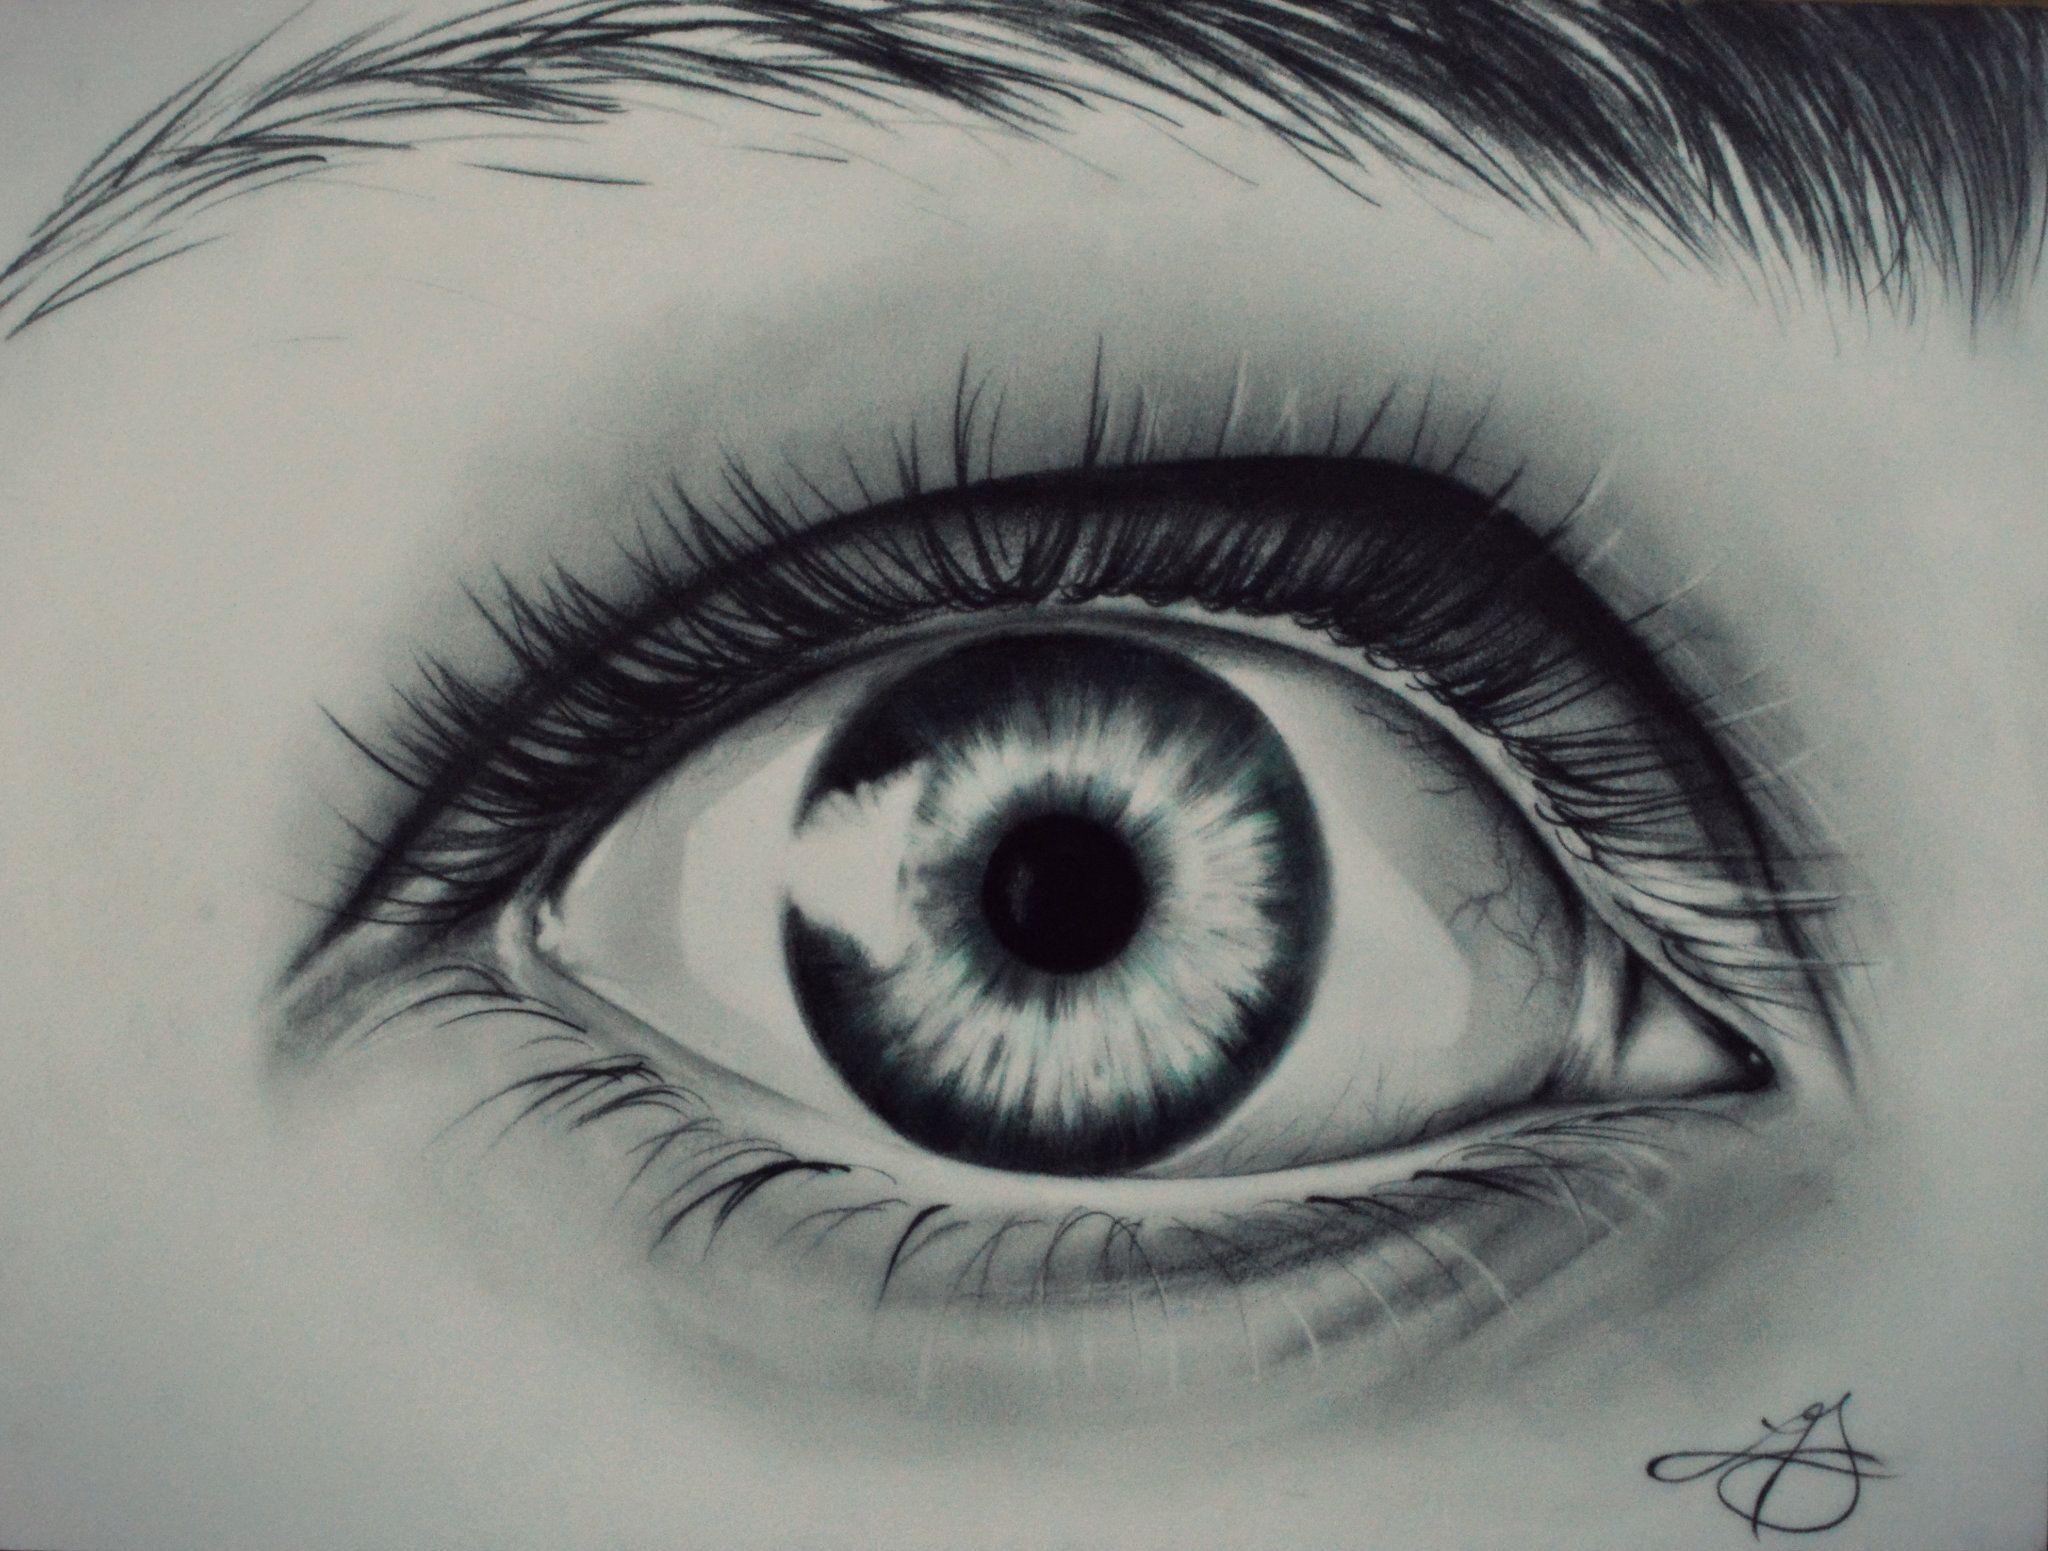 #drawing #eye #eyelashes #eyebrows #green #pencil #drawing ...